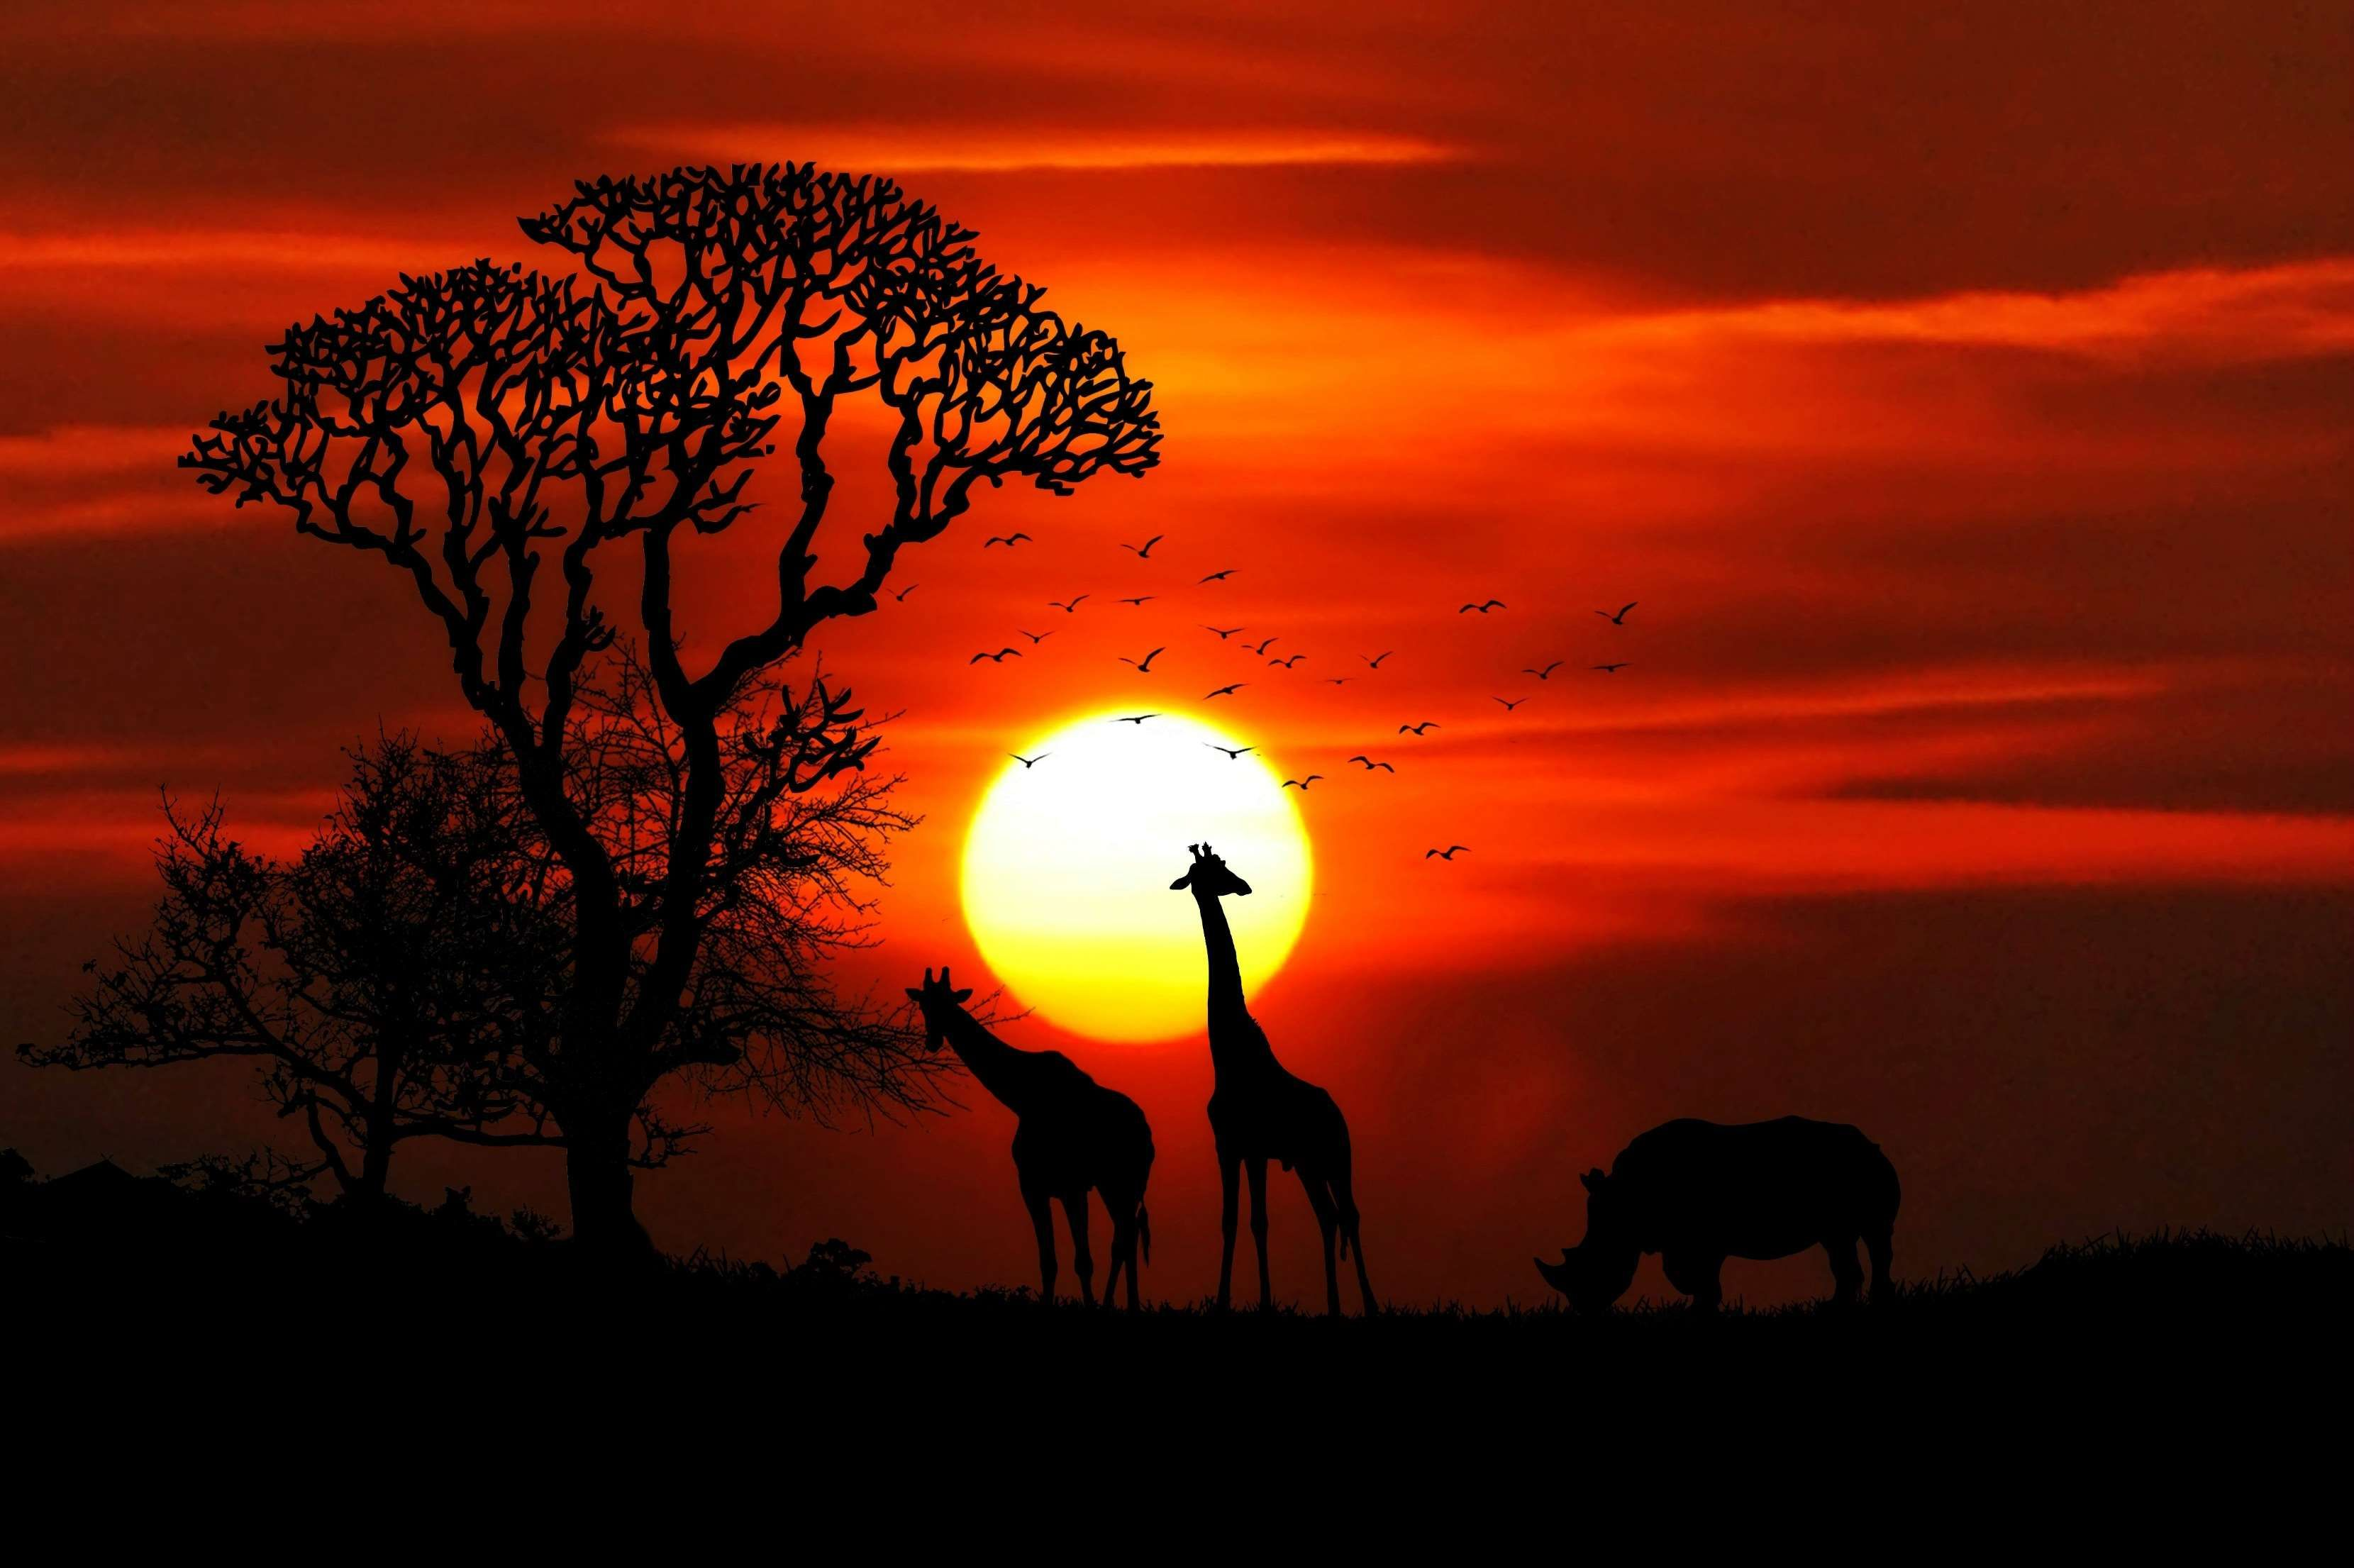 Animals Birds Dawn Giraffe Giraffes Landscape Nature Outdoors Rhino Safari Savannah Silhouette Sun Sunse African Sunset Sunset Canvas Animals Wild